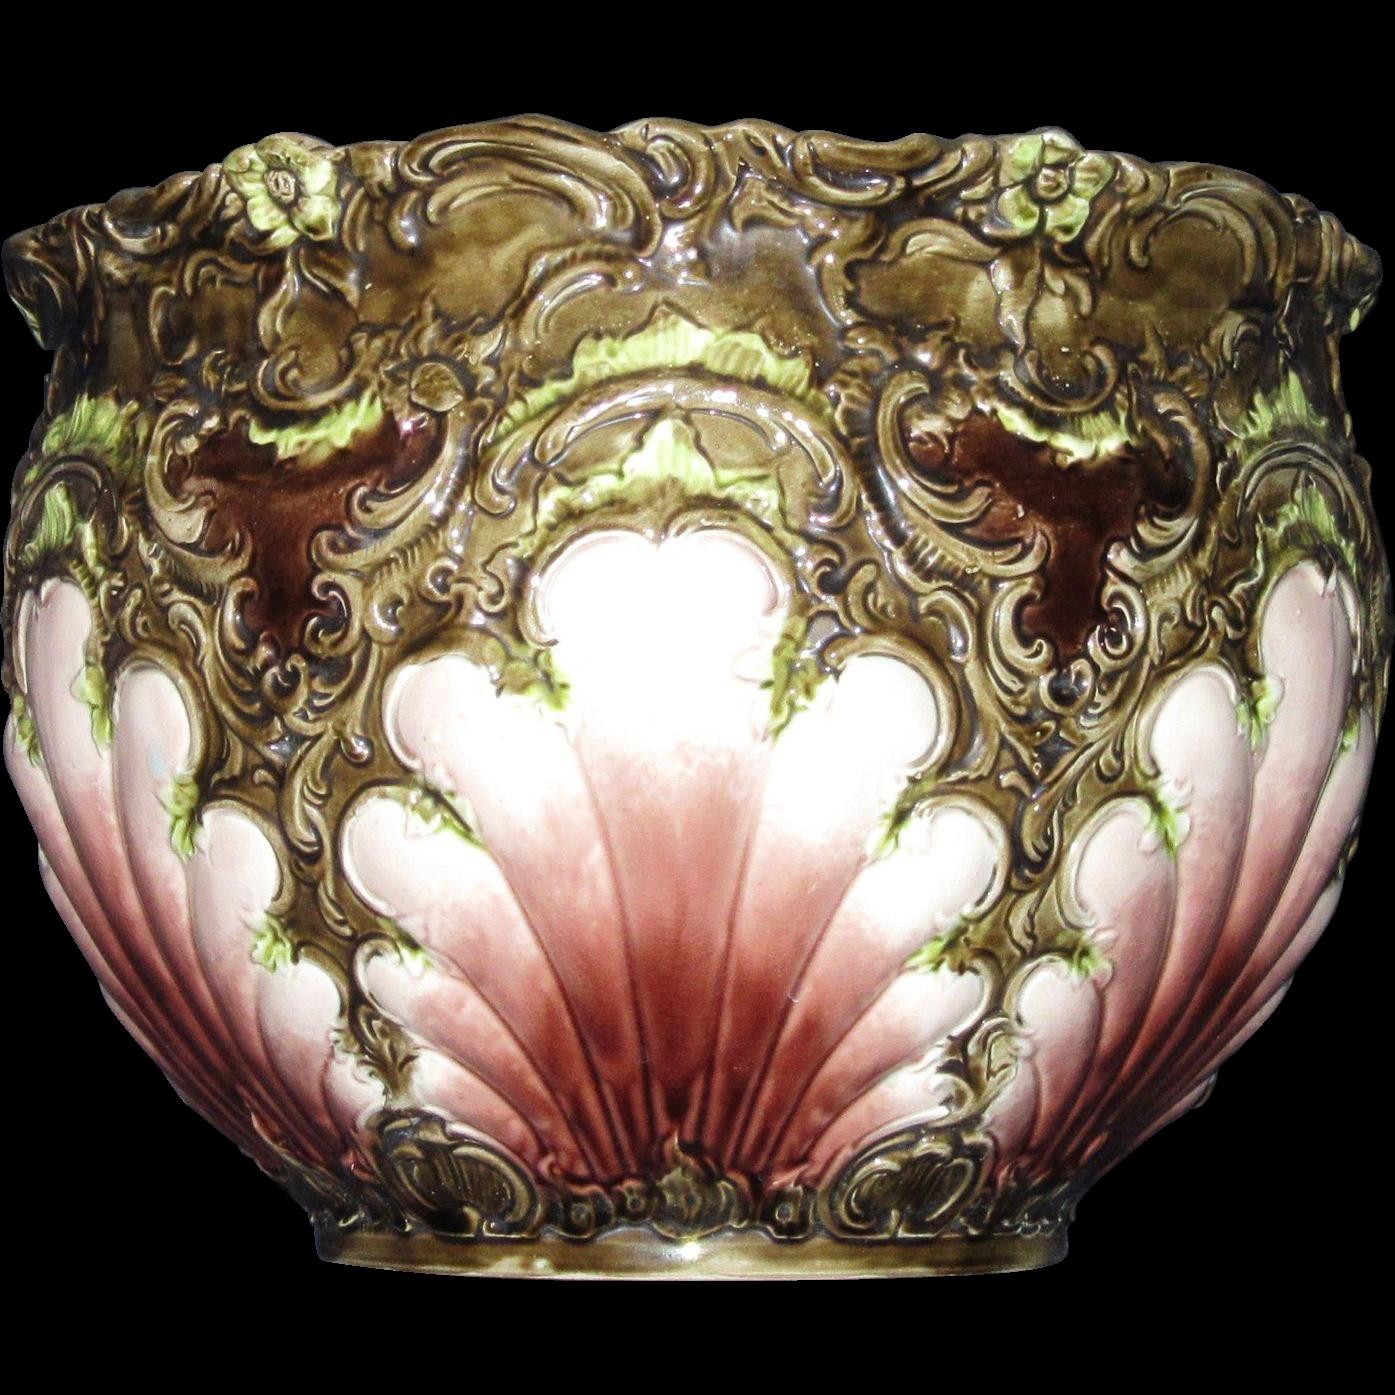 Nineteenth Century Art Nouveau Majolica Jardinière, Cache Pot, Seashell Motif